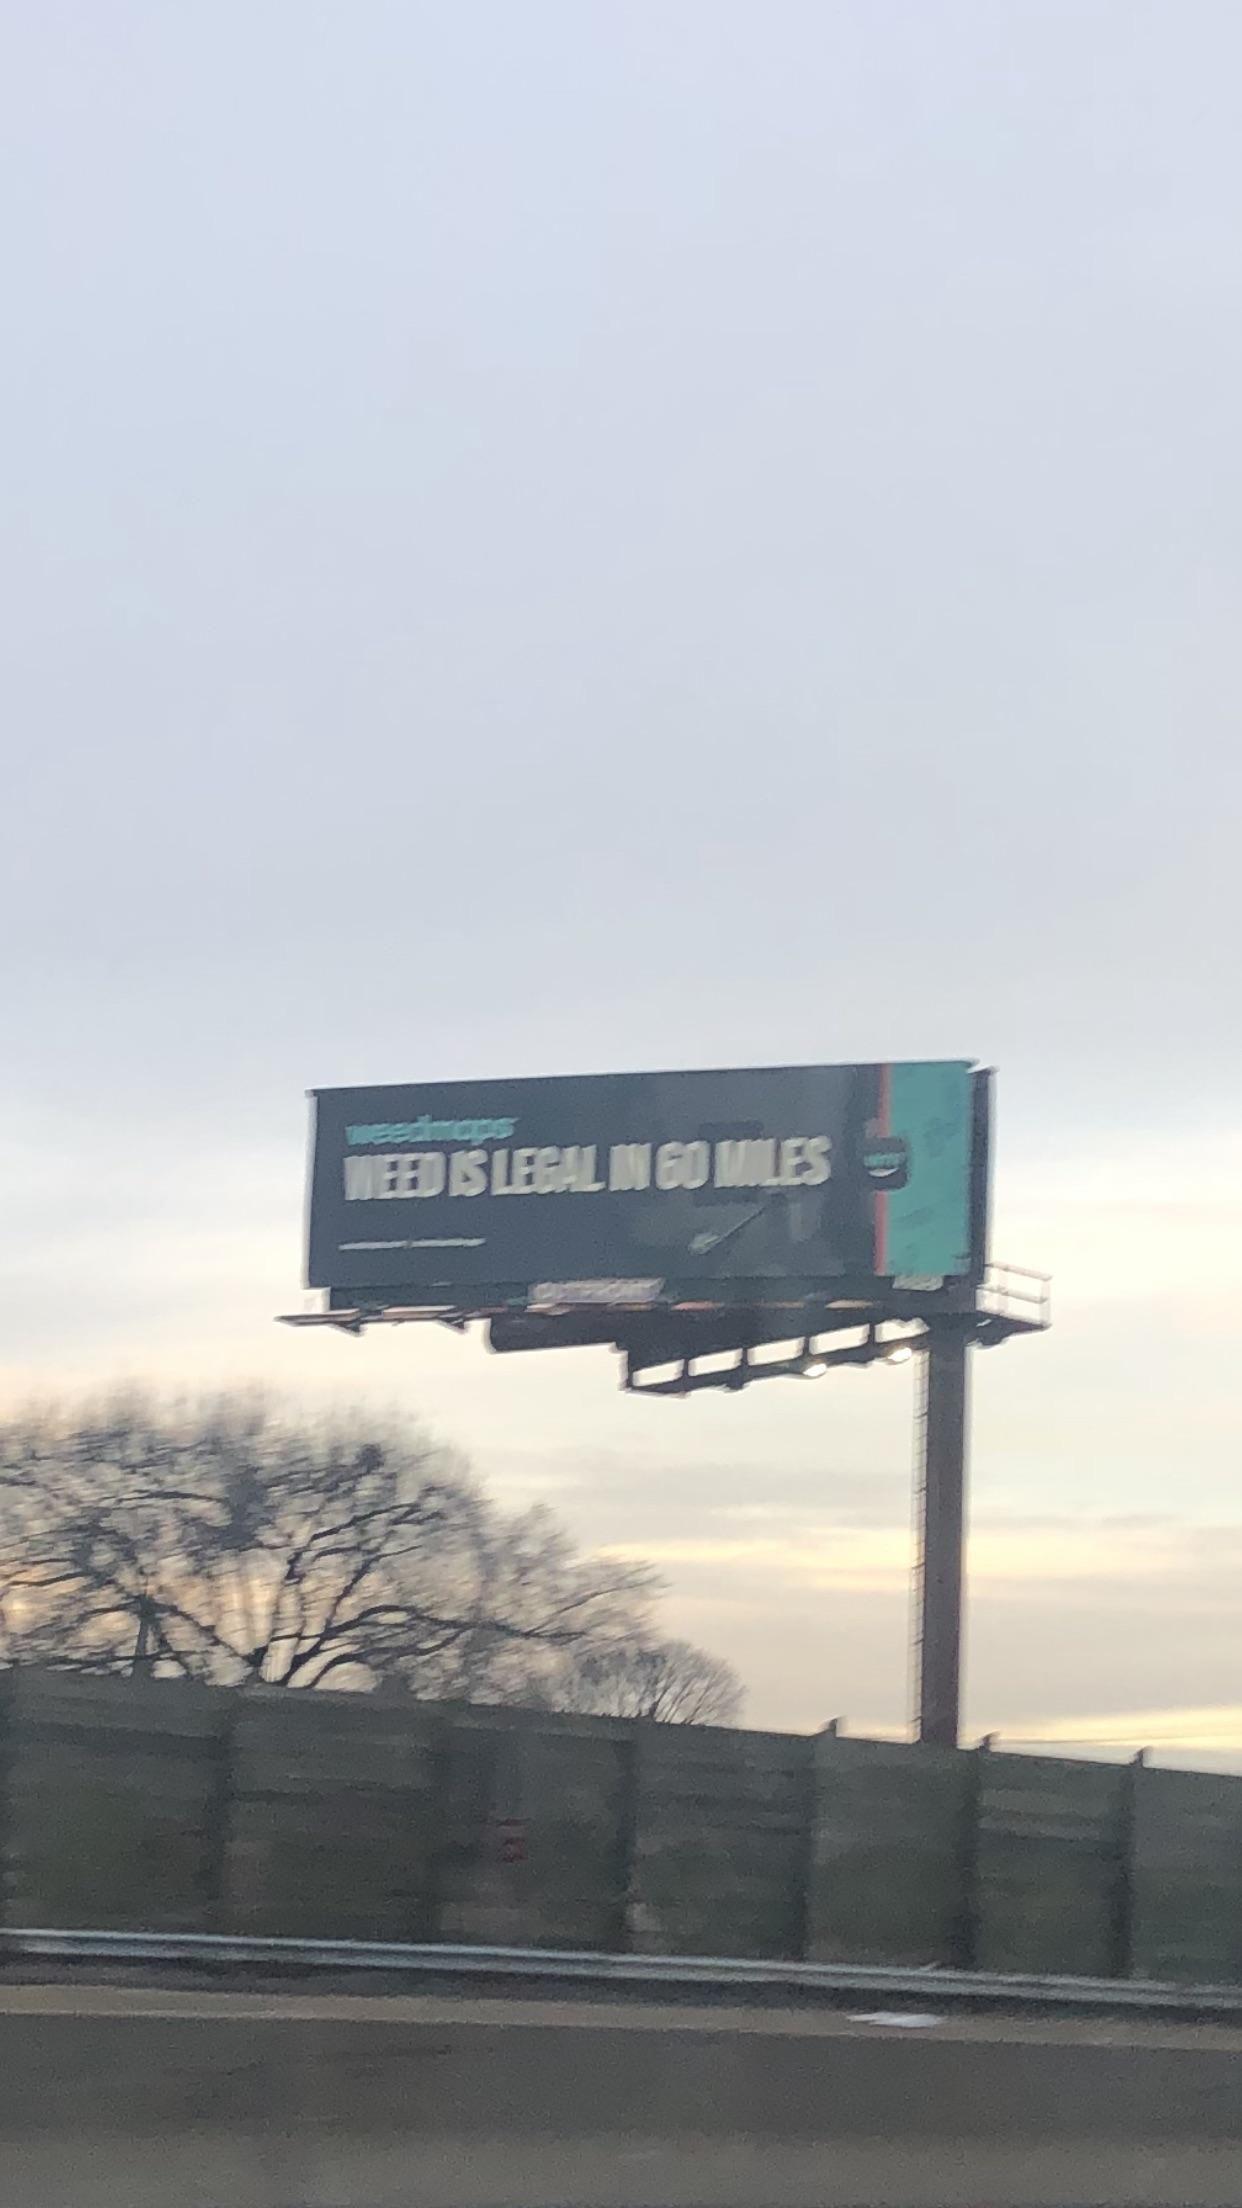 Amazing billboard seen in Connecticut